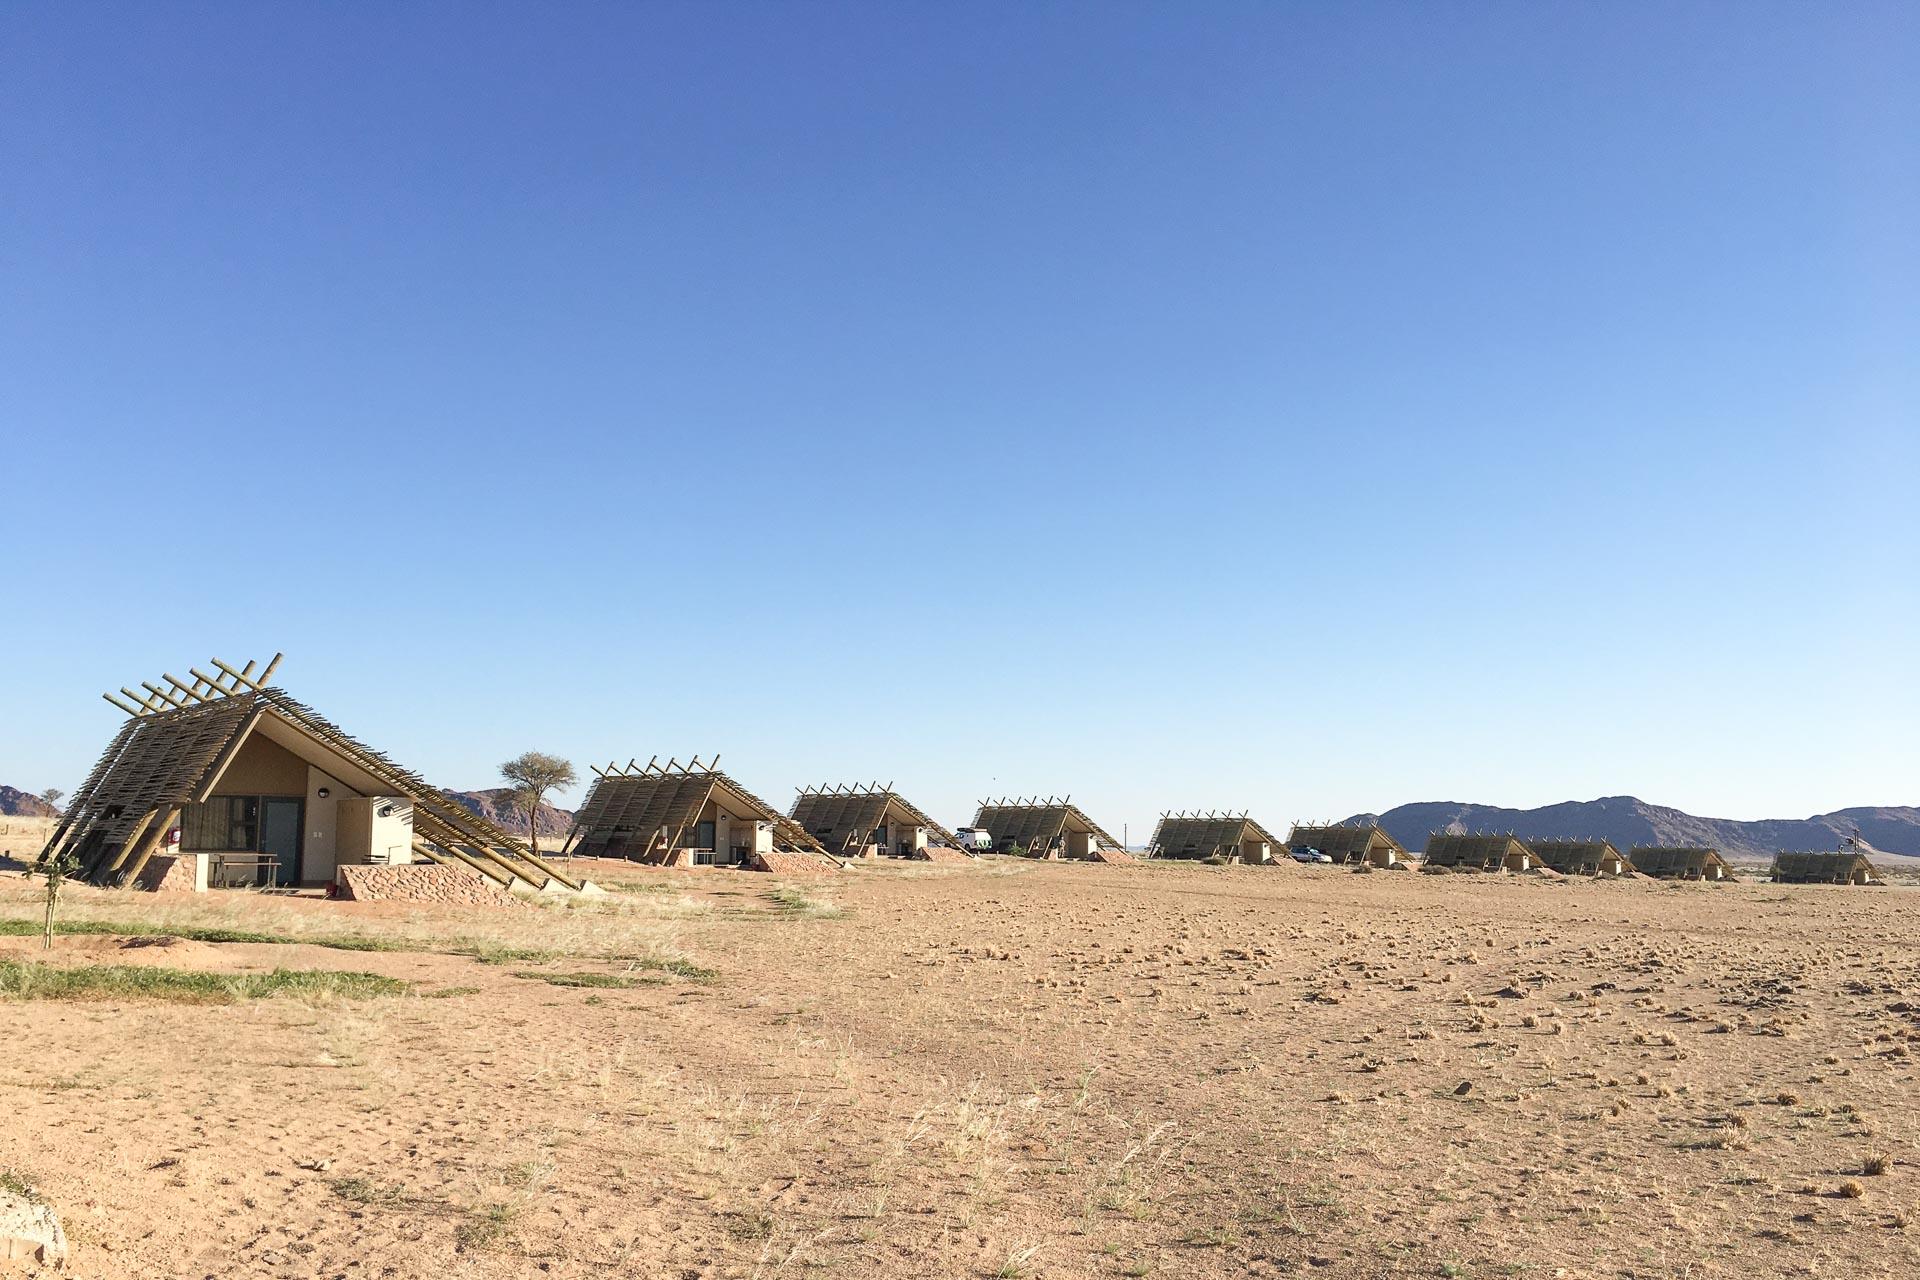 Desert-Quiver-Camp-Namibia-Globetrotter-Select-8